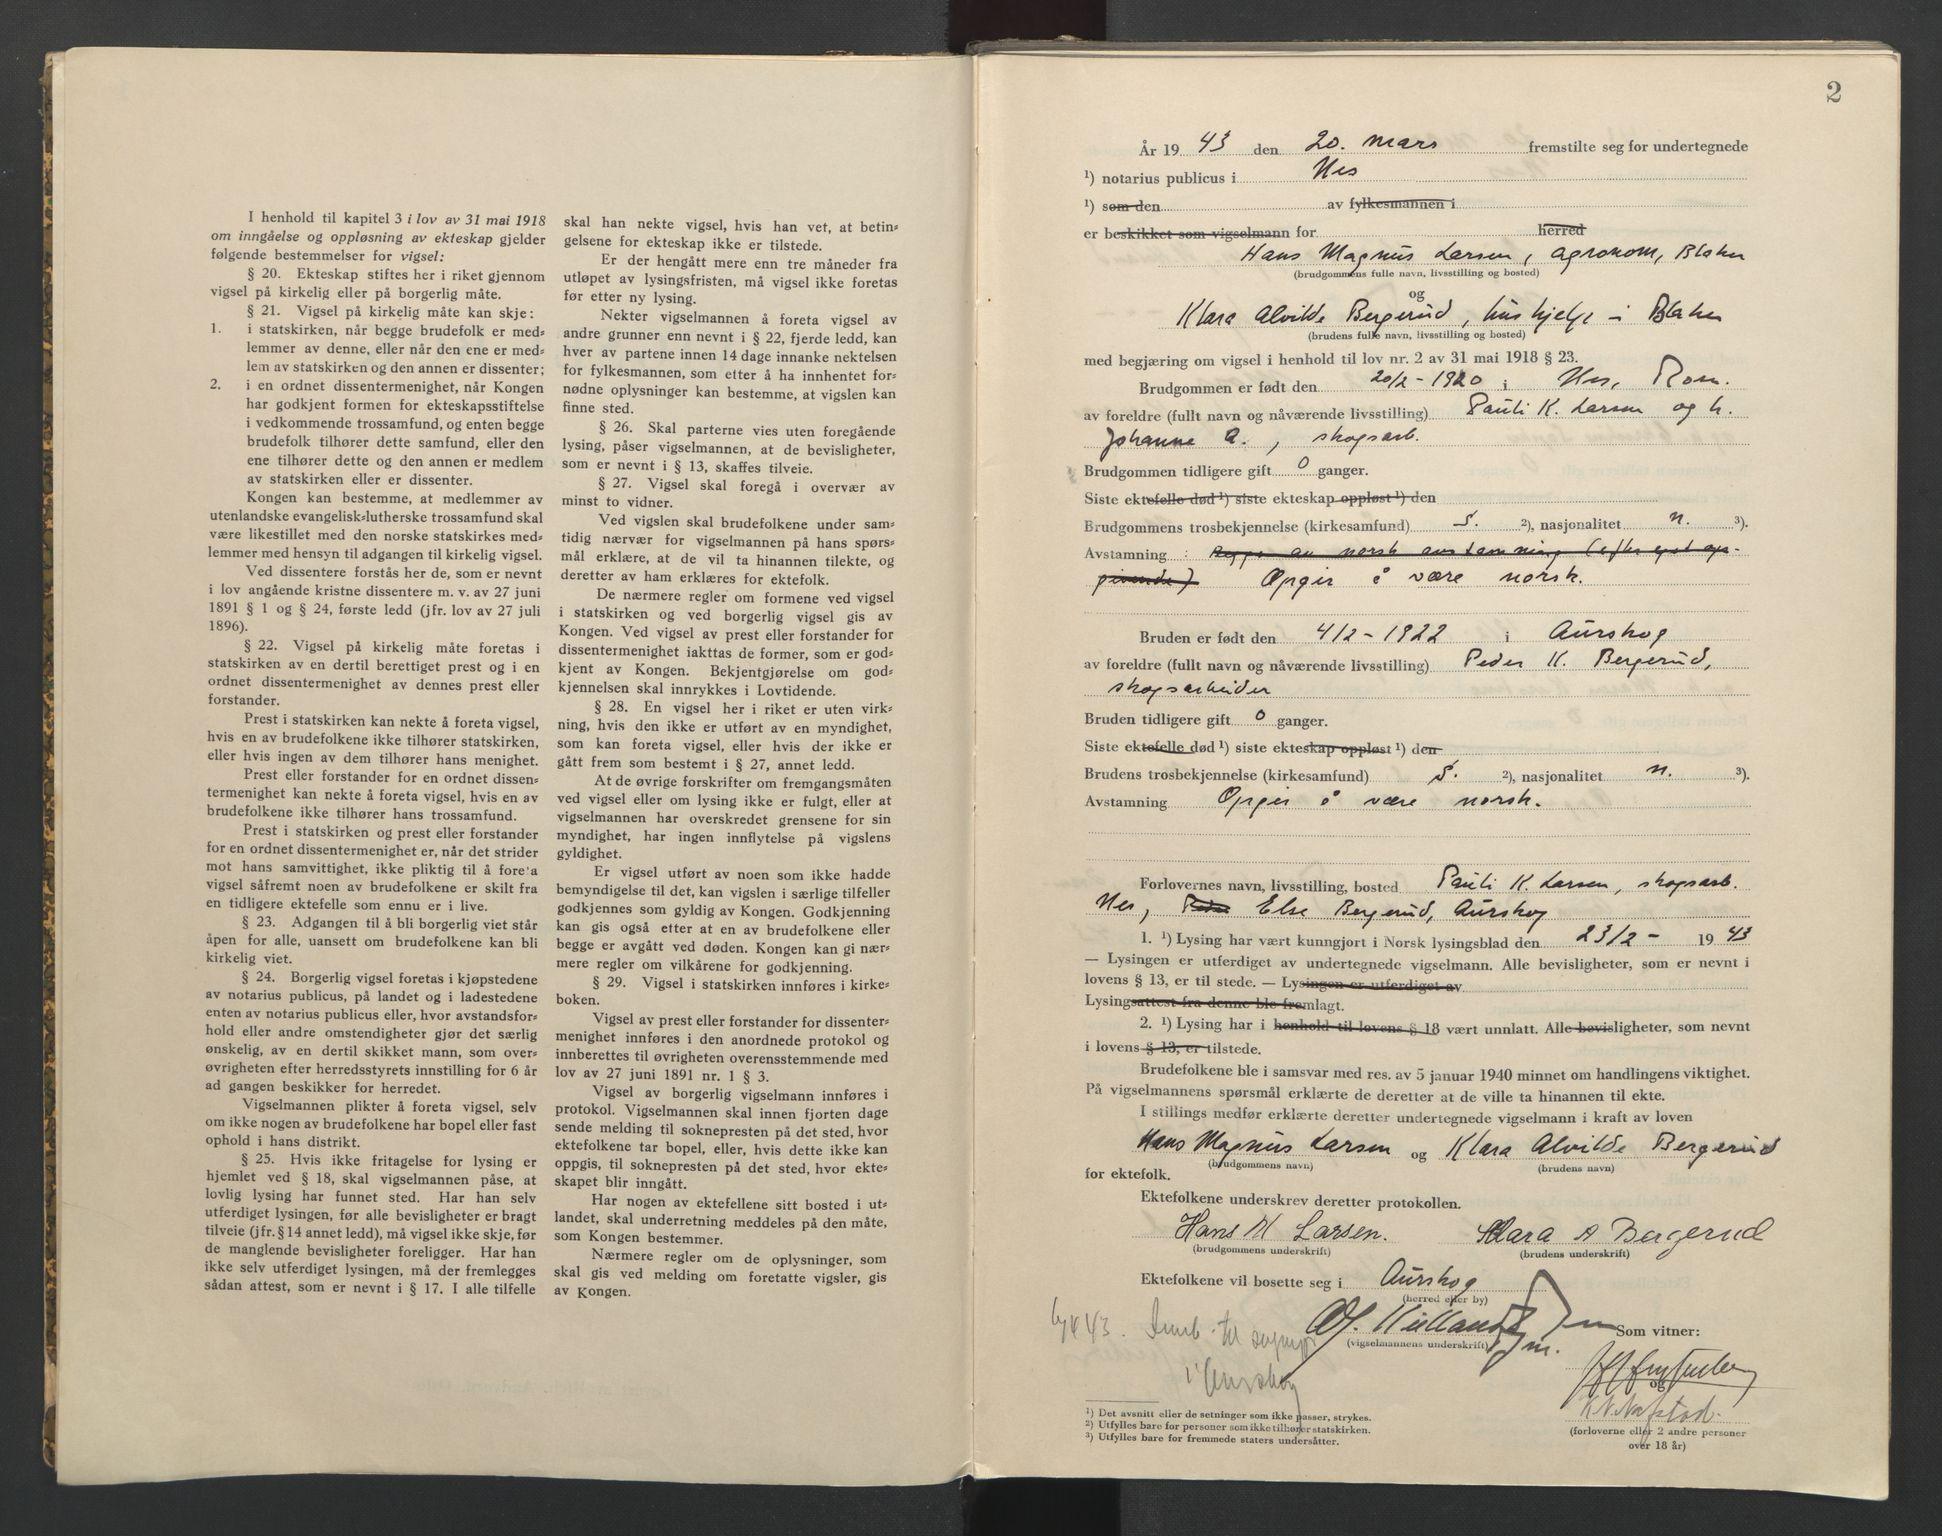 SAO, Nes tingrett, L/Lc/Lca/L0002: Vigselbok, 1943-1944, s. 2